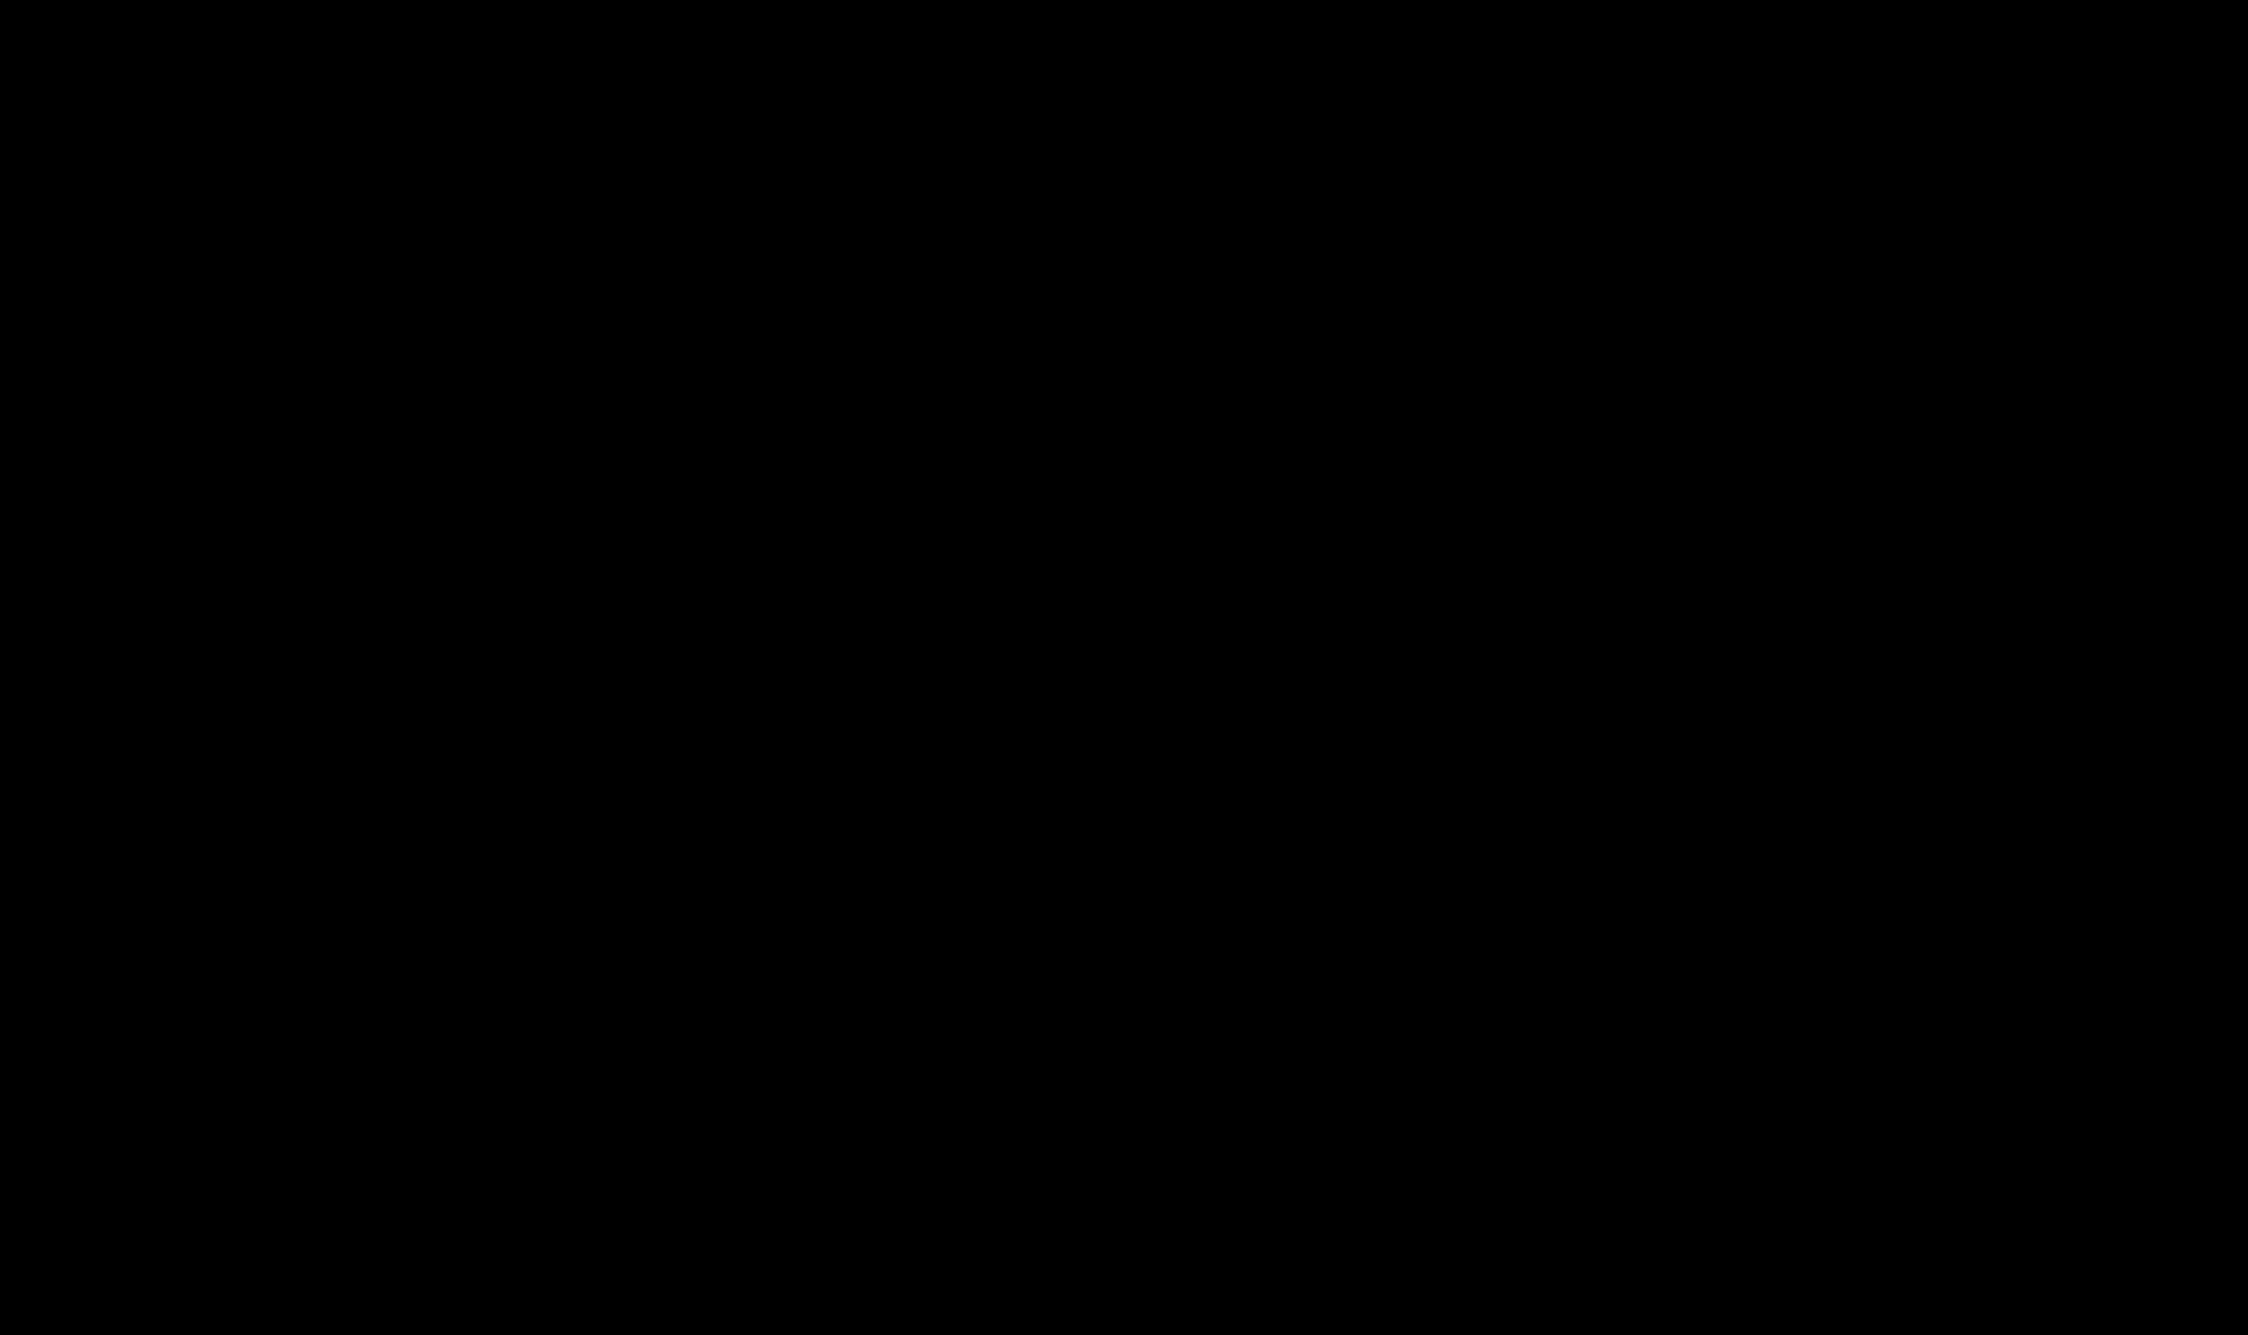 NH₂-dPEG®₄-Glu(OH)-[NH-dPEG®₄-Glu(OH)]₂-NH-m-dPEG®₂₄